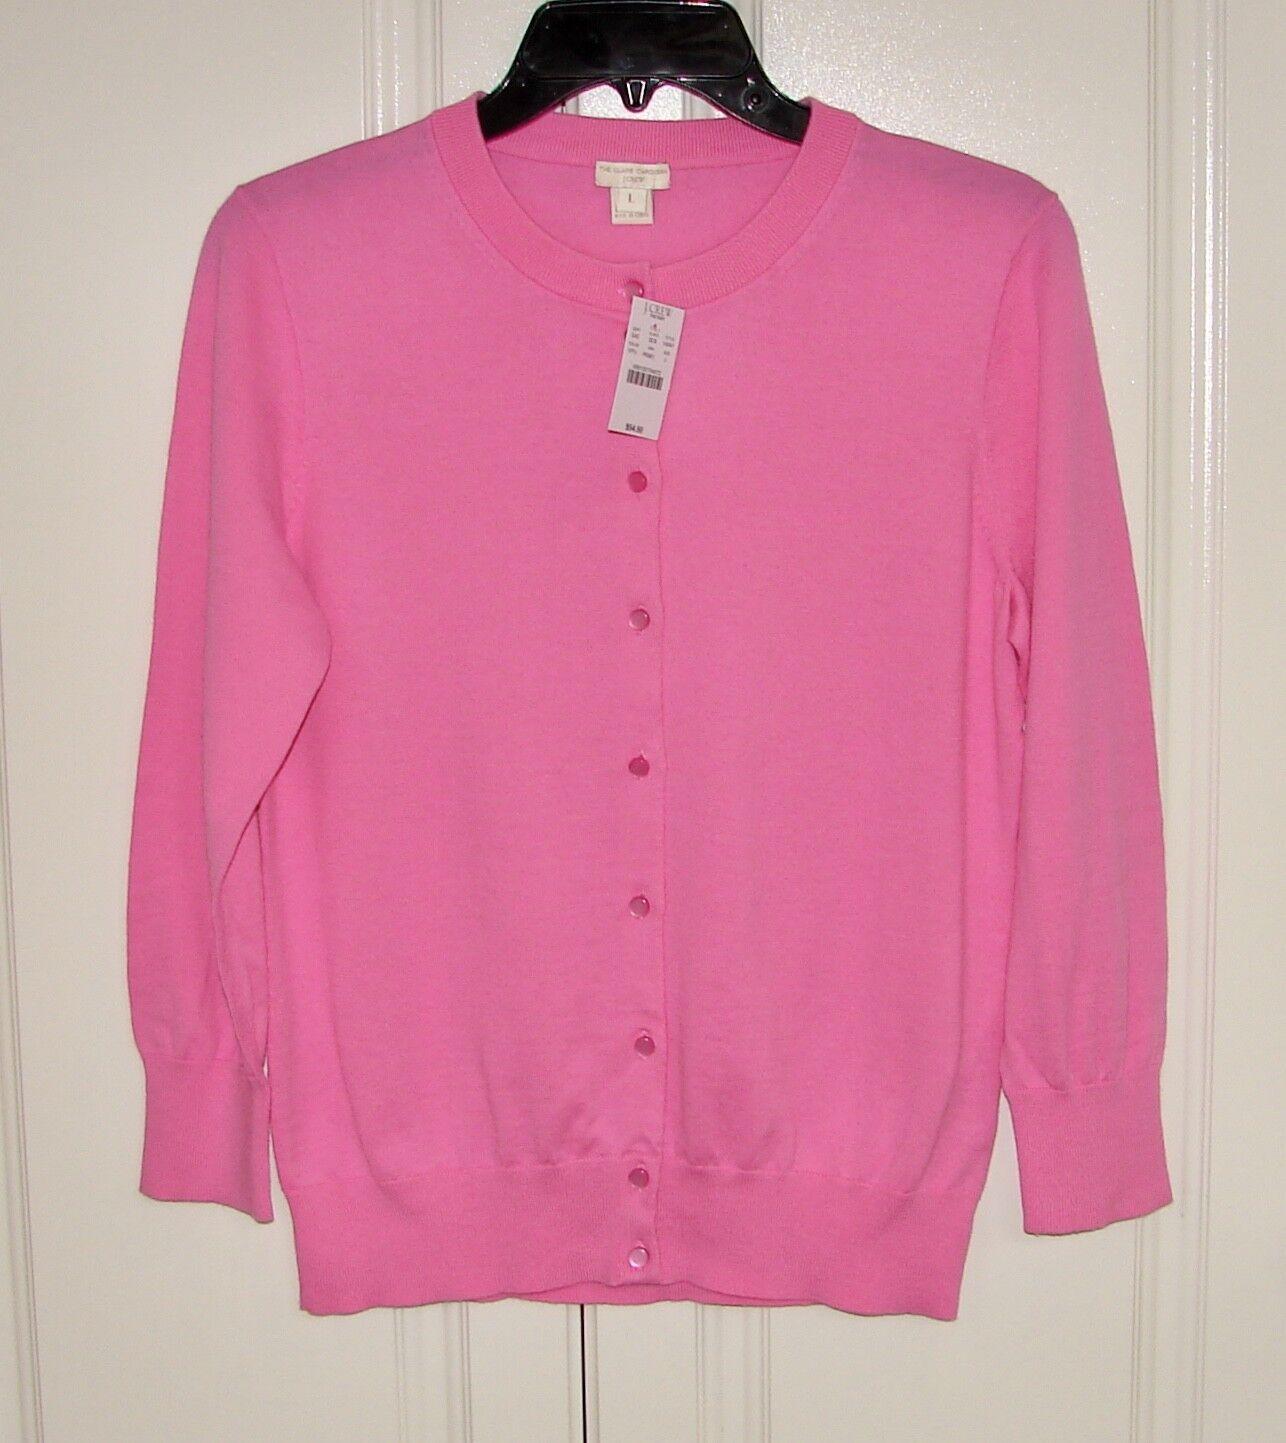 NWT J Crew Factory sz L pink cotton Clare cardigan sweater